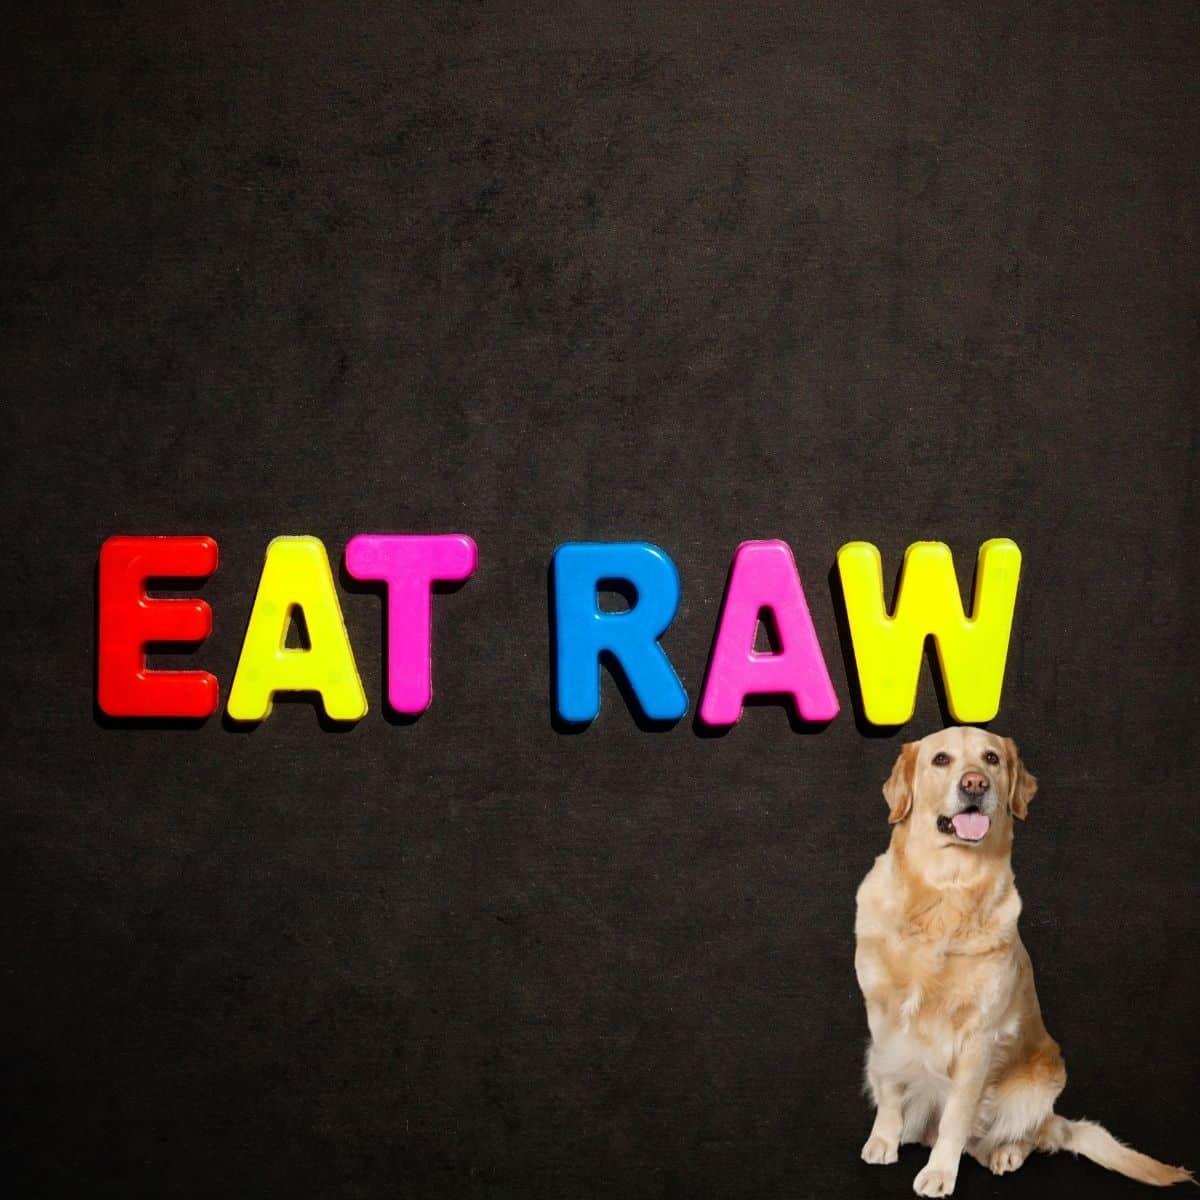 eat raw dog food